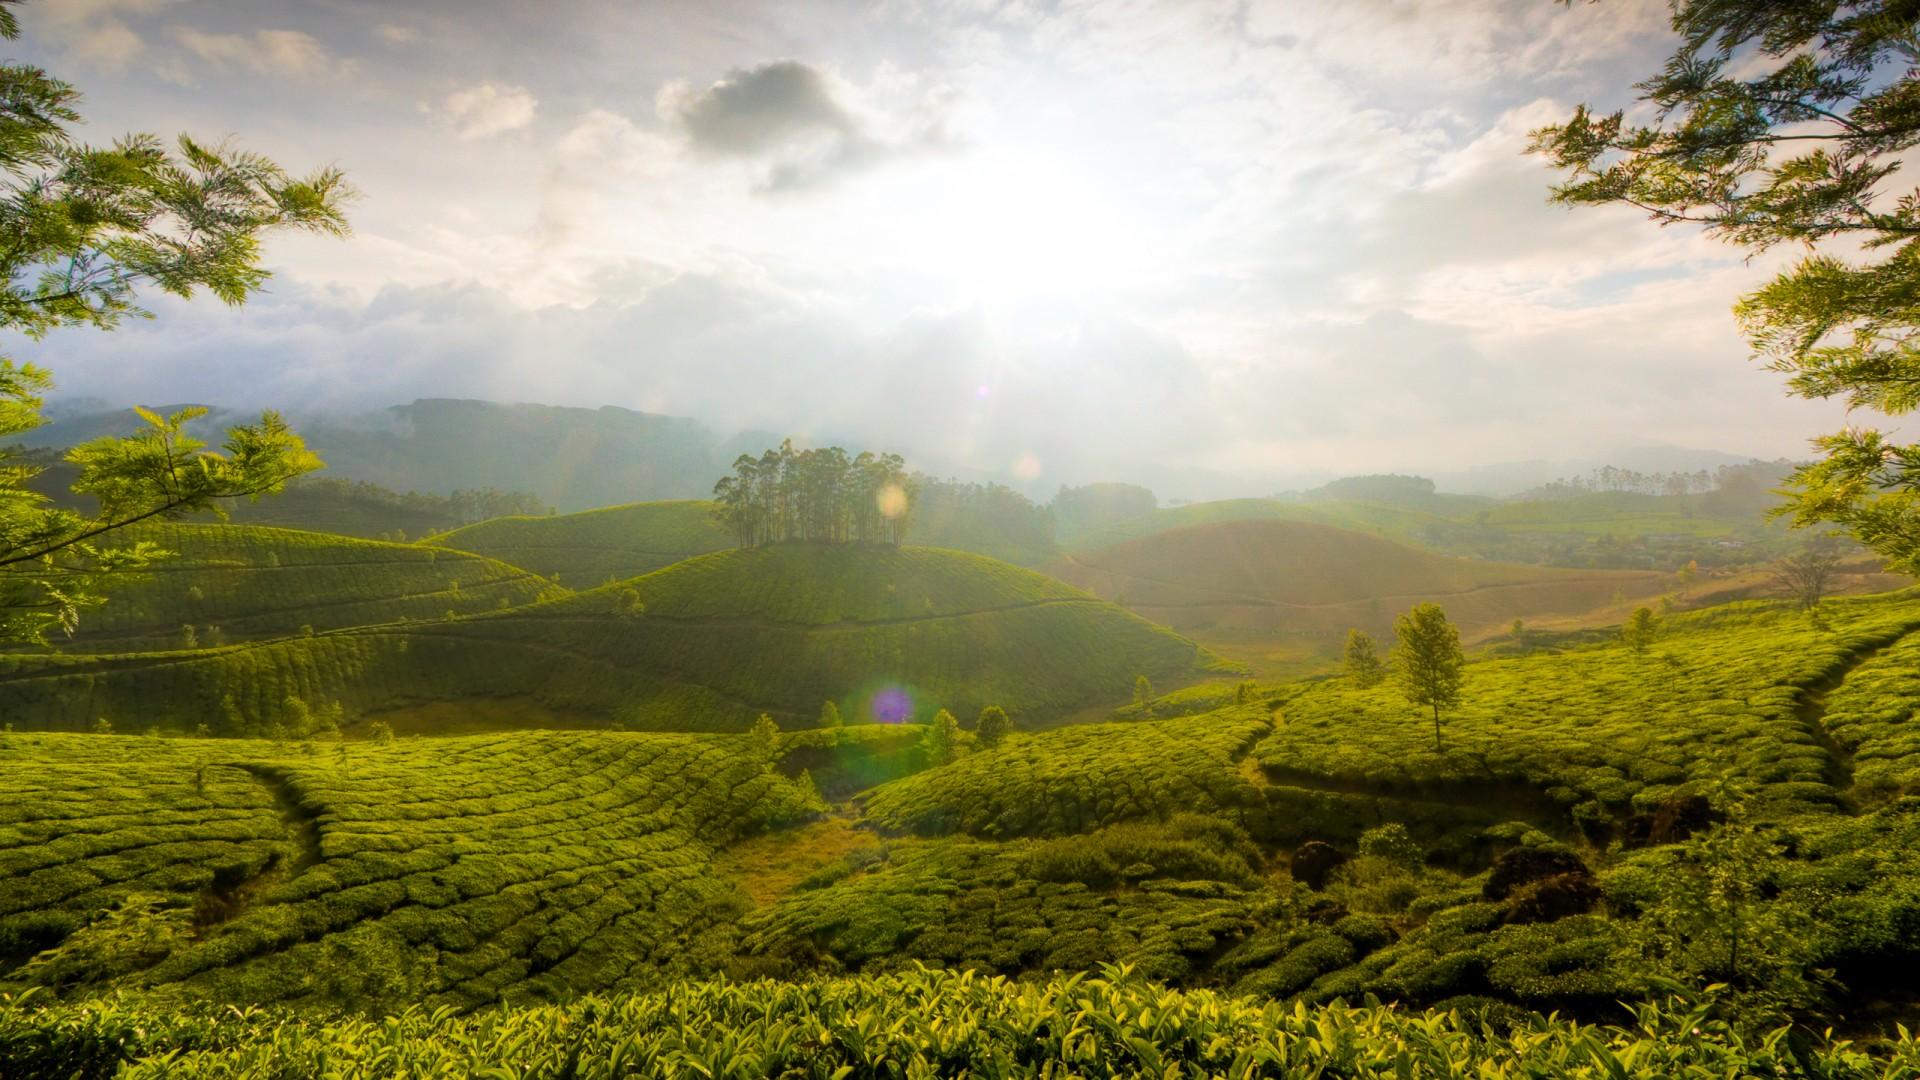 Munnar Hills Kerala India Wallpapers Hd Wallpapers Id